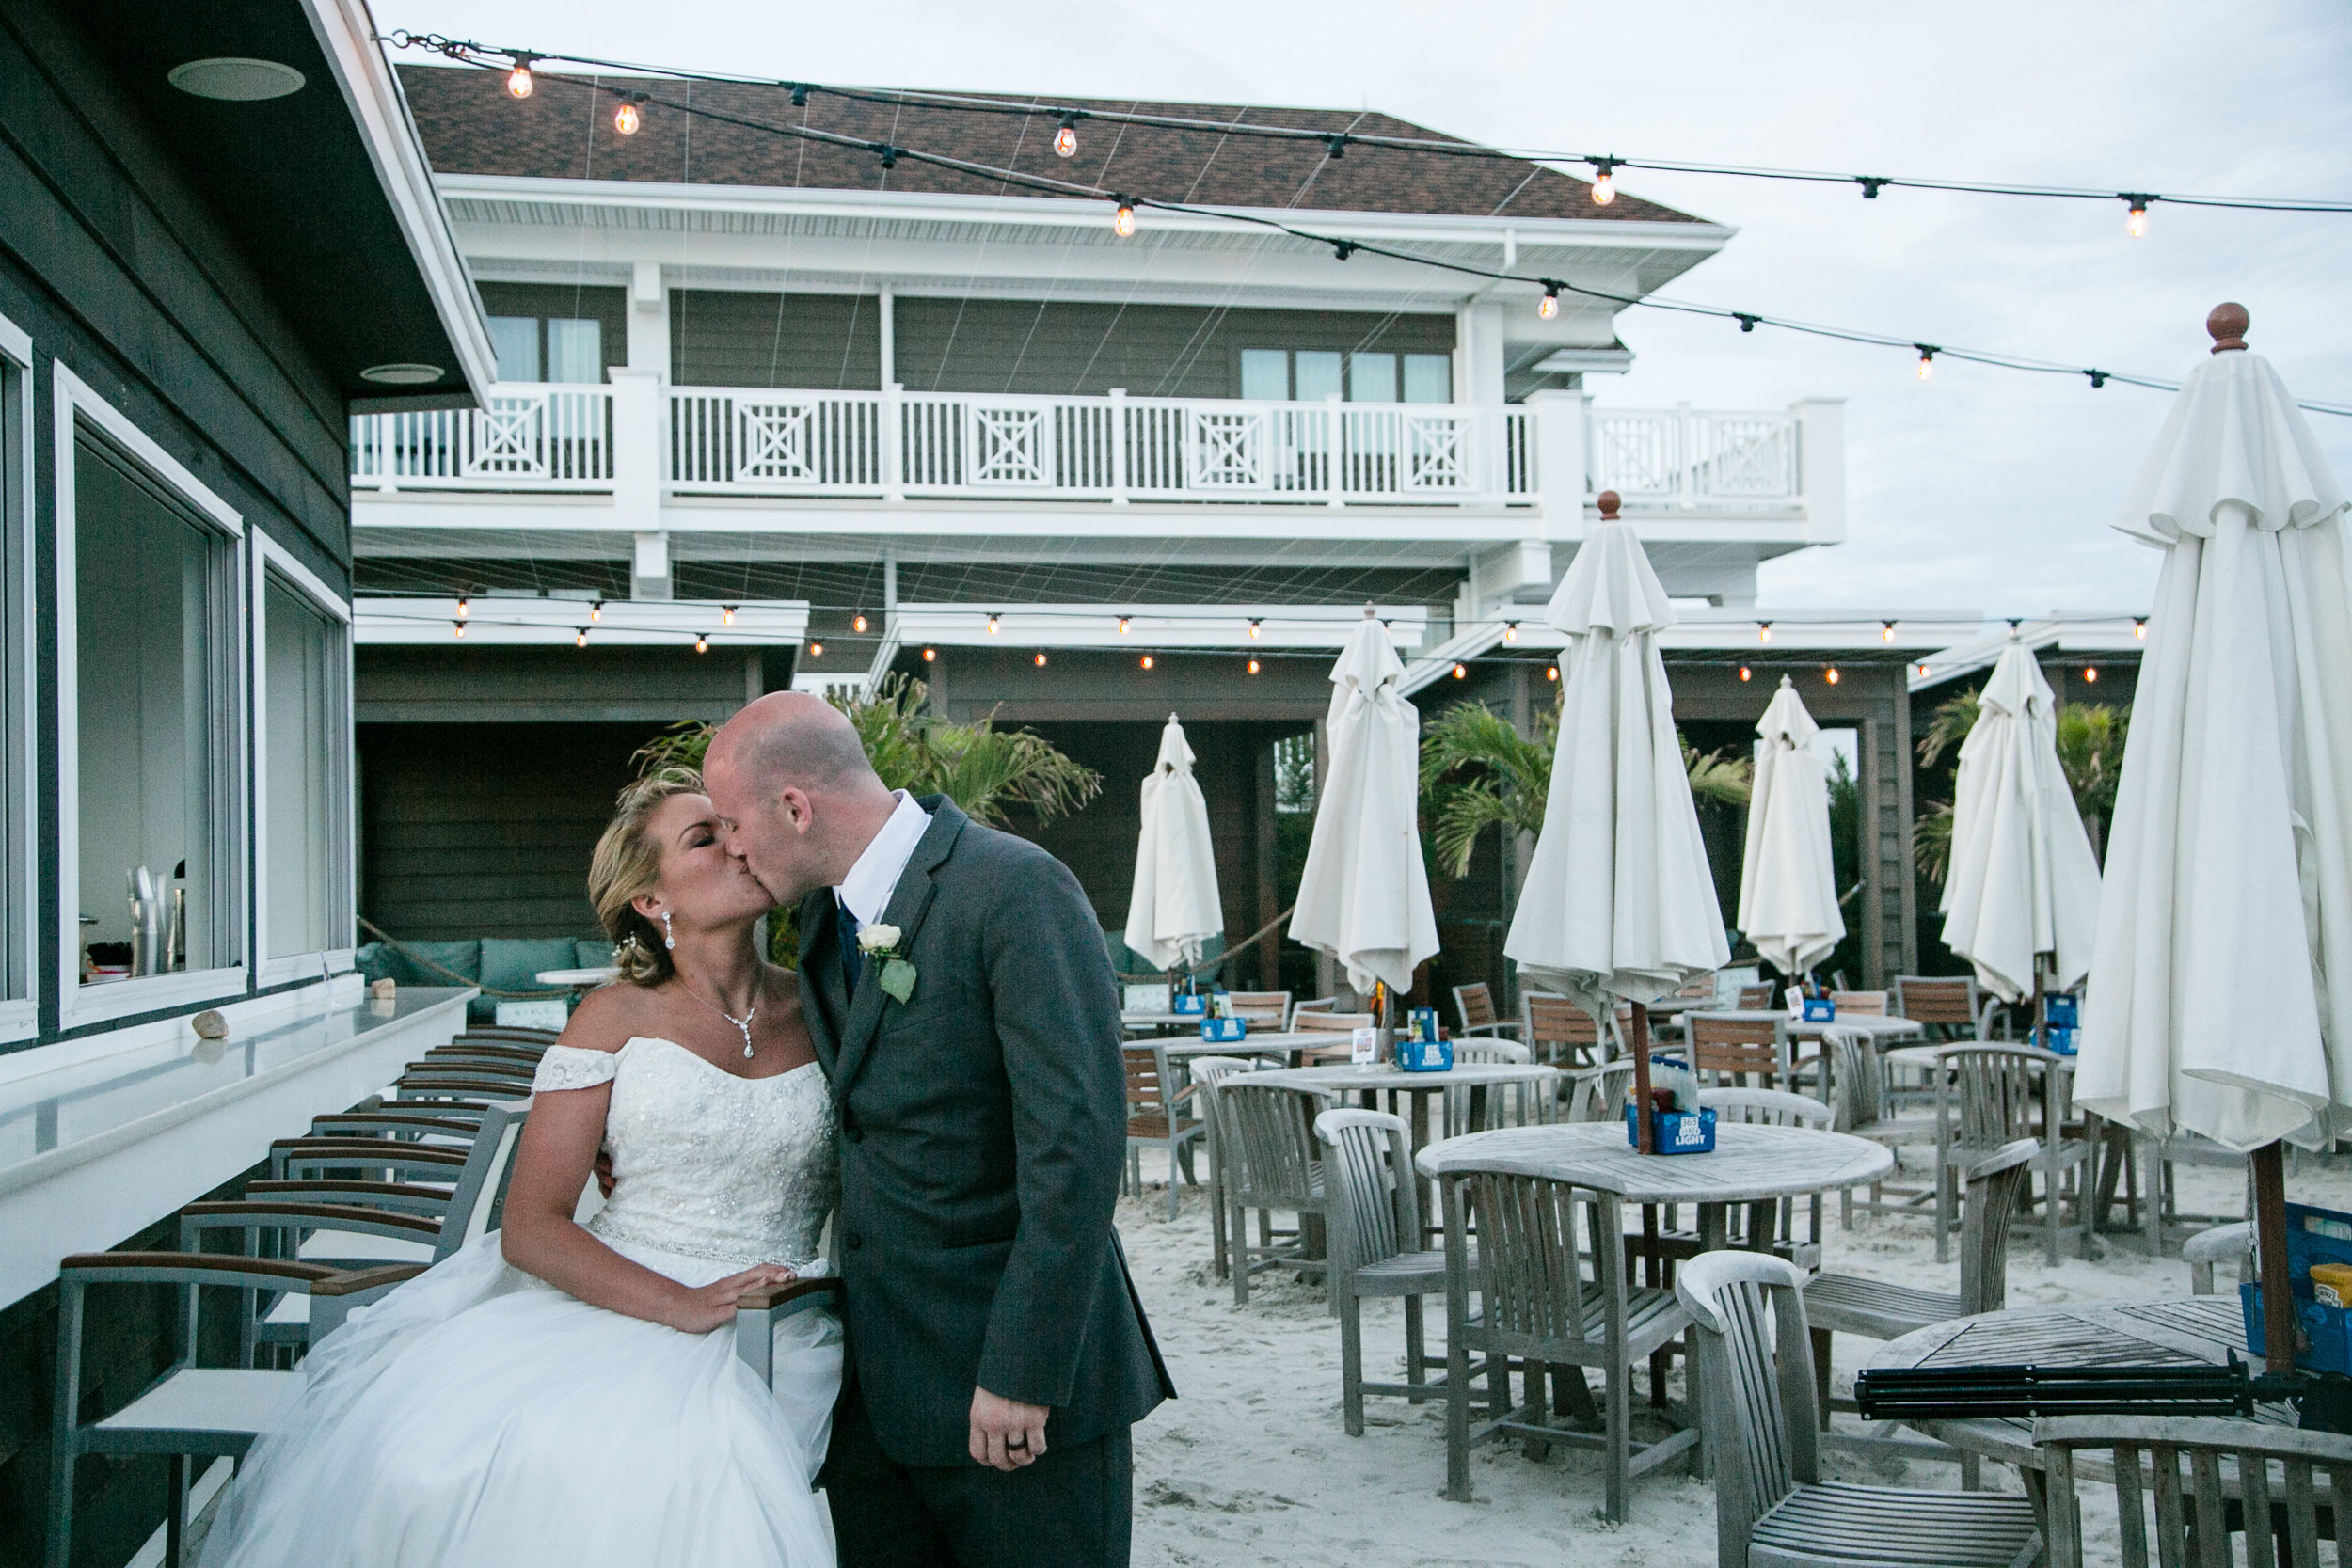 ICONA GOLDEN INN AVALON NJ WEDDING PHOTOGRAPHY  - 086.jpg